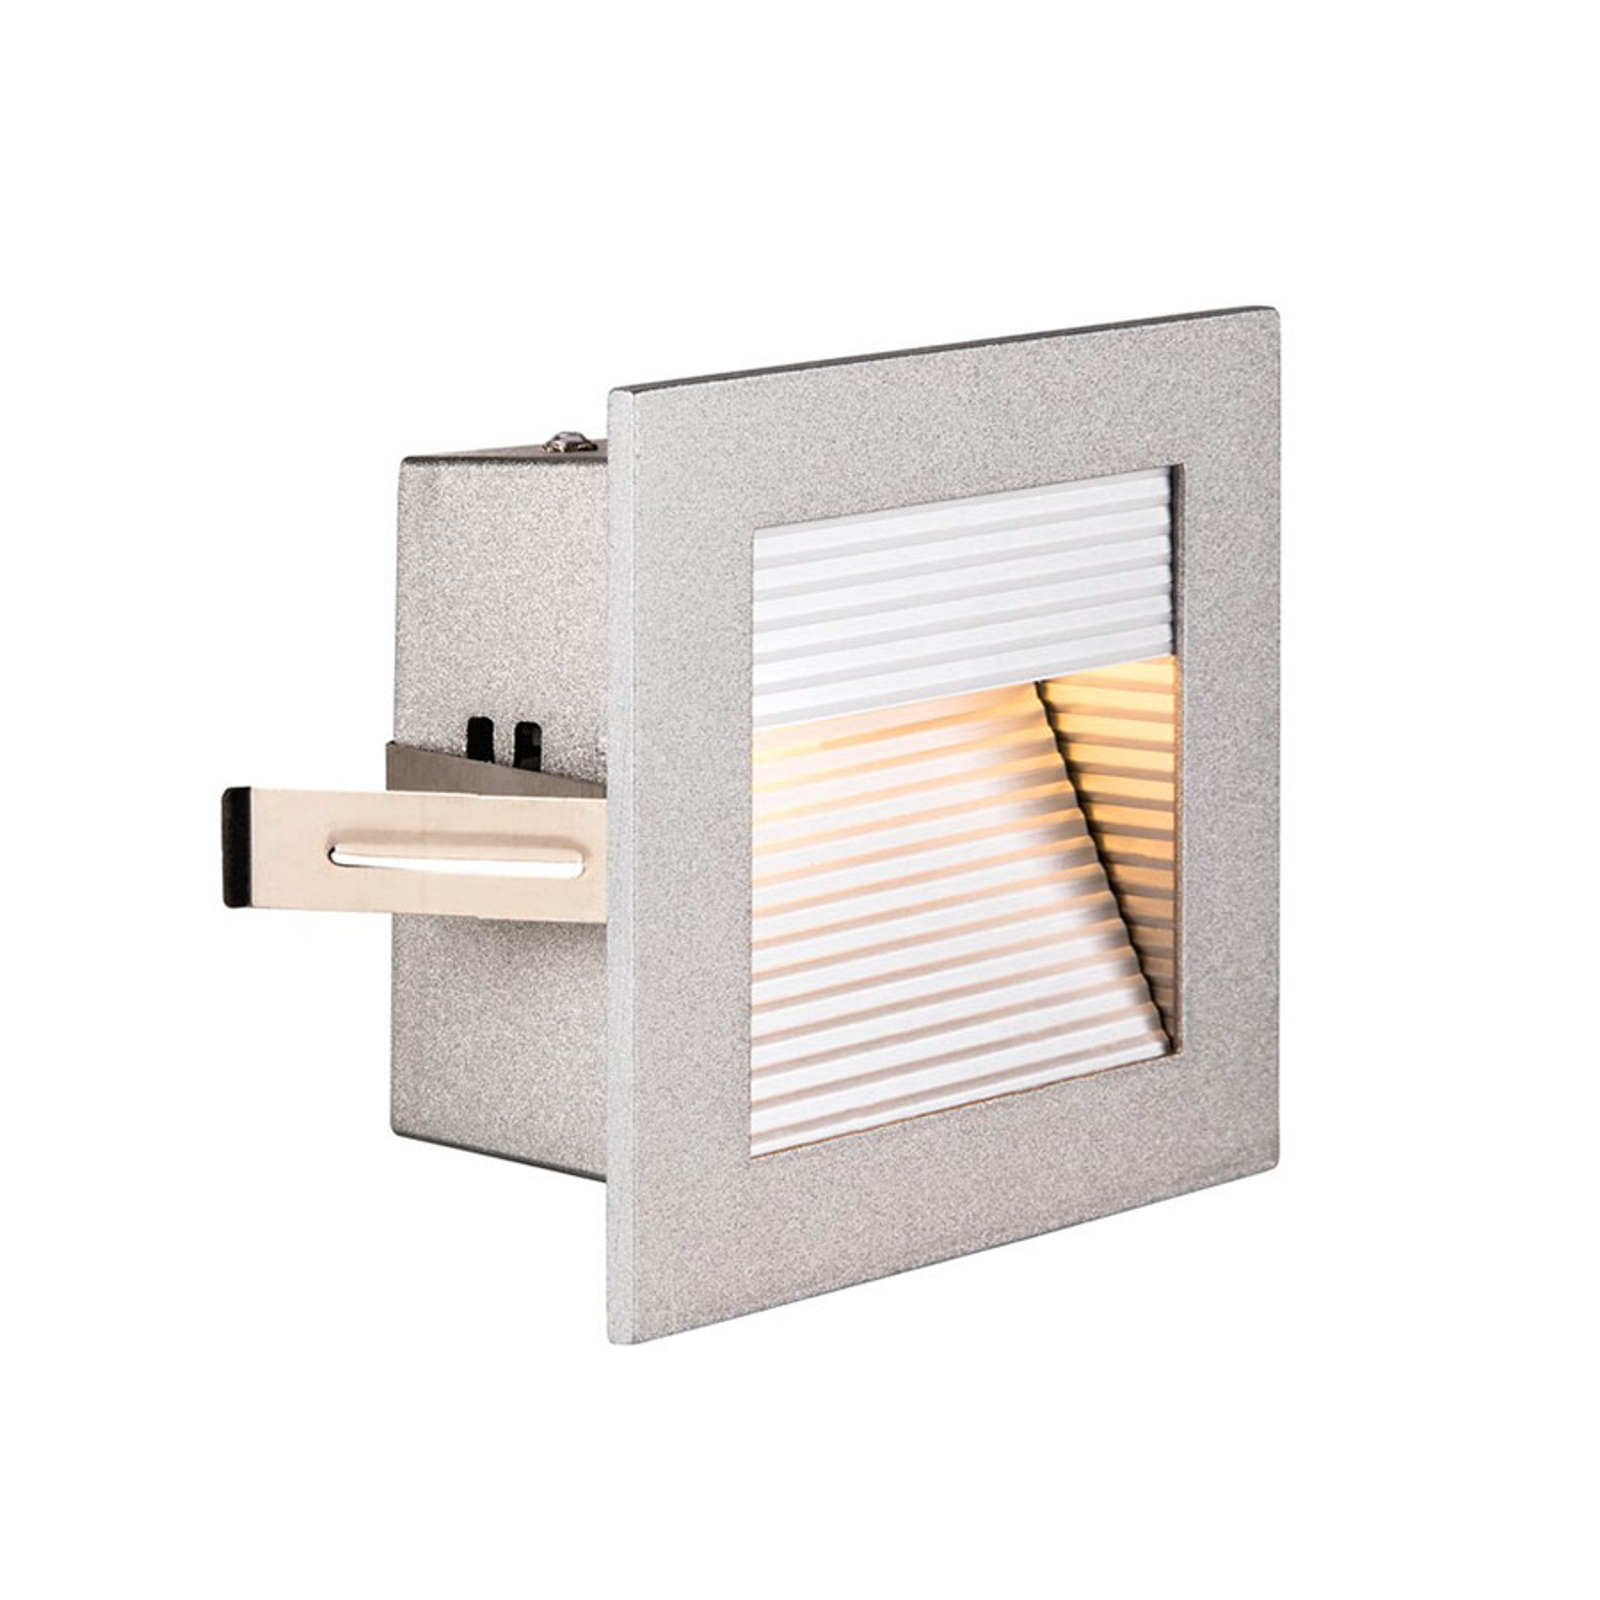 SLV Frame Curve LED Einbauleuchte silber